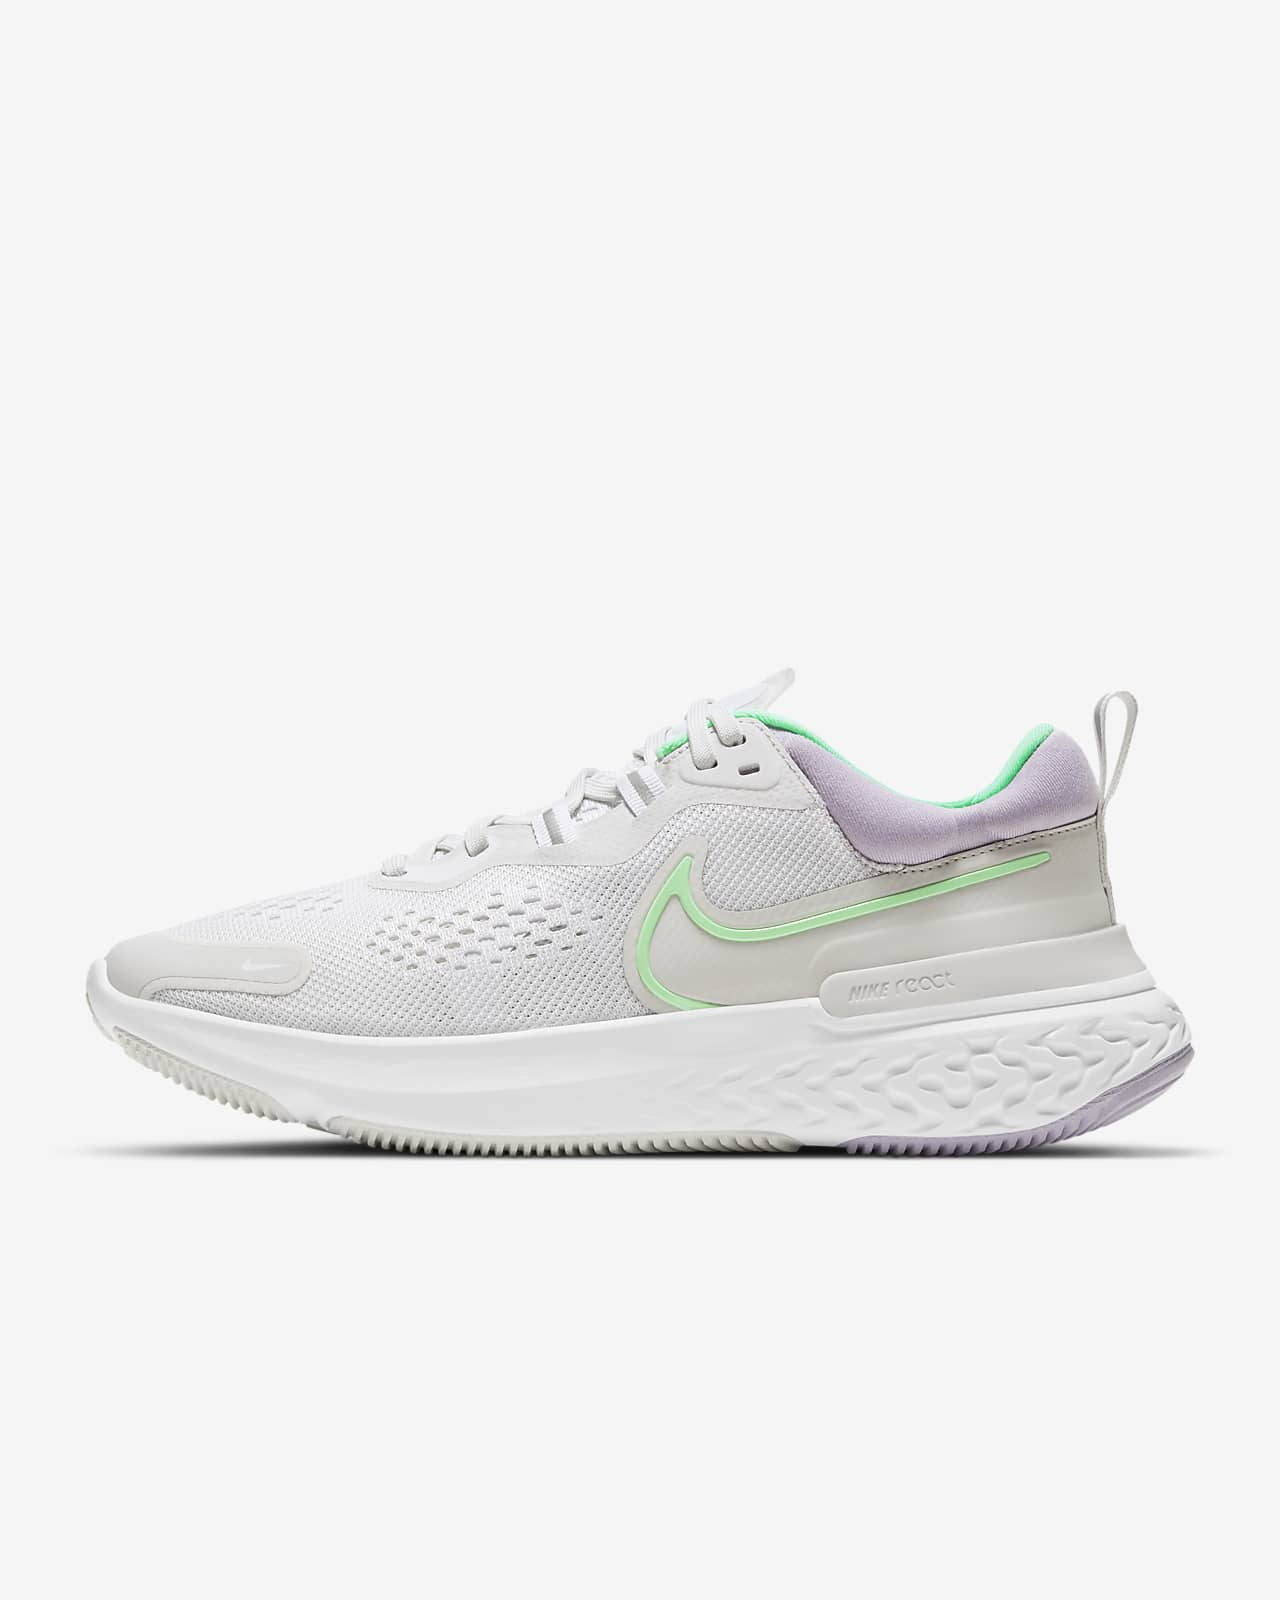 Calzado de running de carretera para mujer Nike React Miler 2